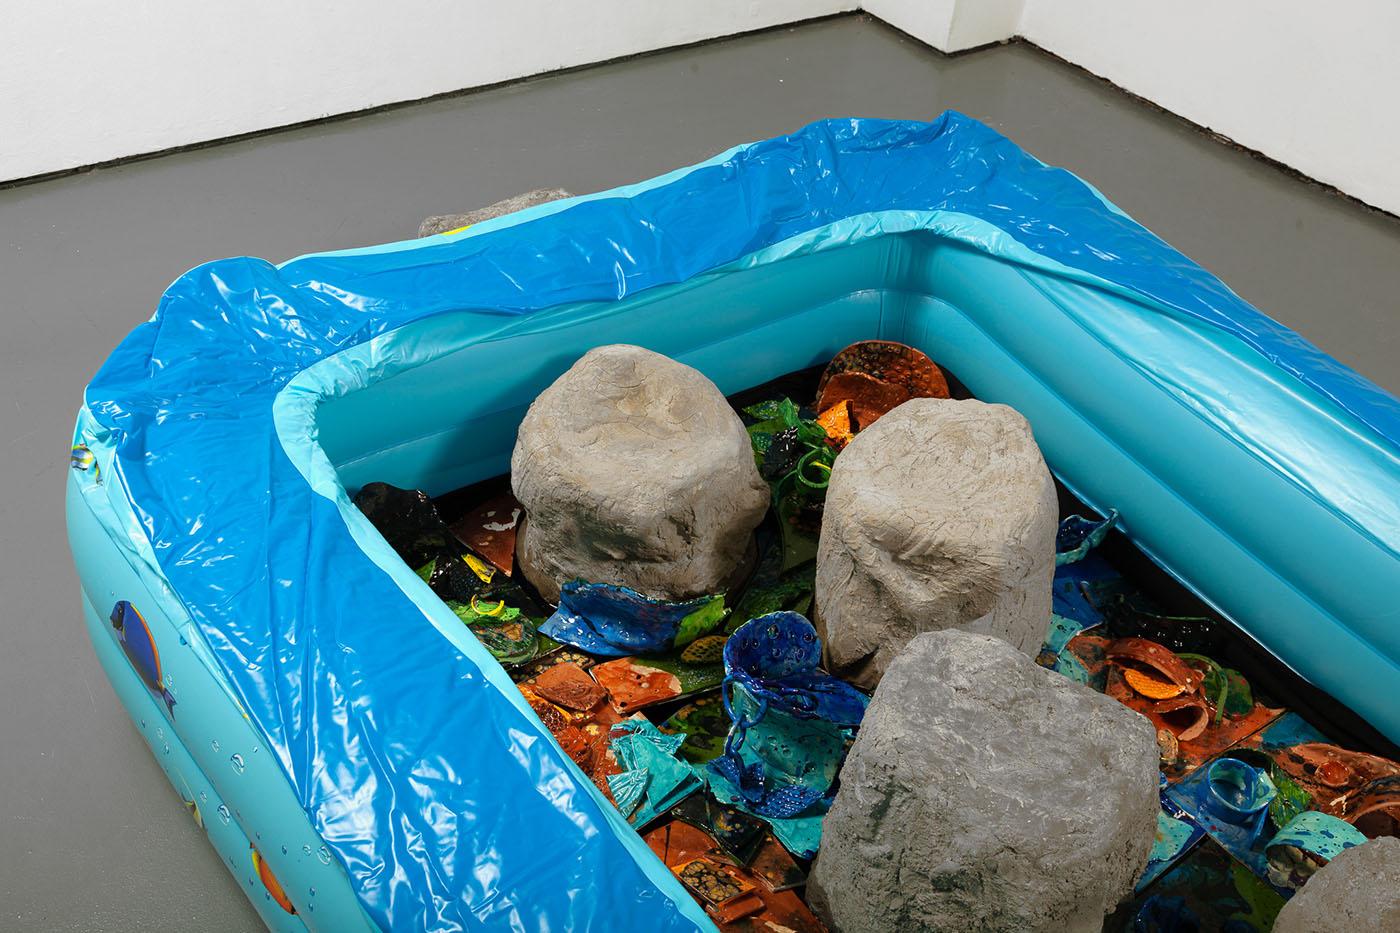 Detail of sculpture: ceramic tiles inside of a plastic pool.